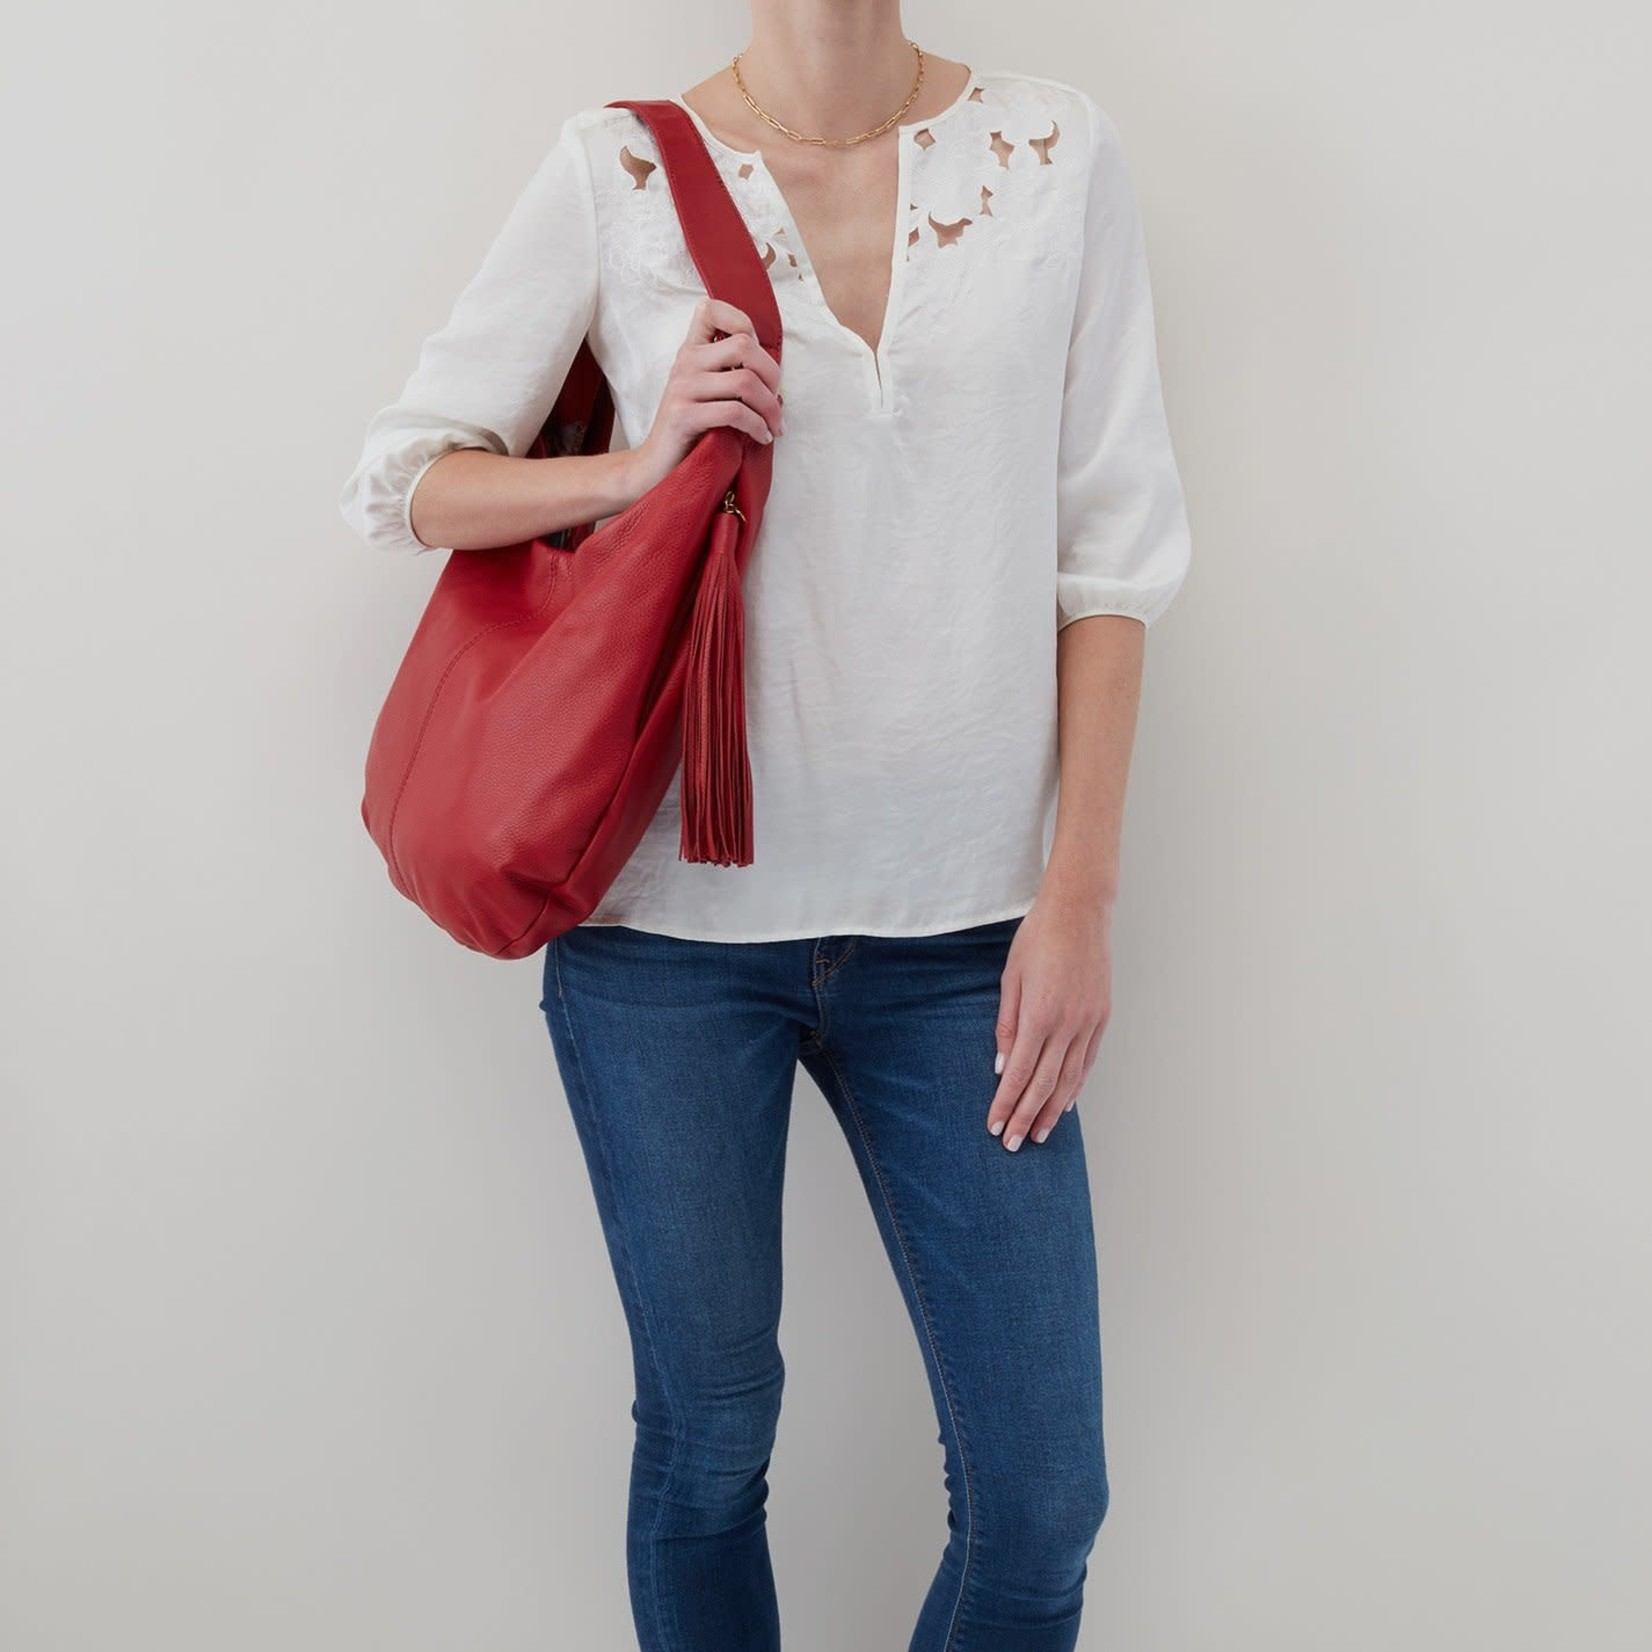 HOBO Gardner Scarlet Soft Hide Leather Hobo Bag